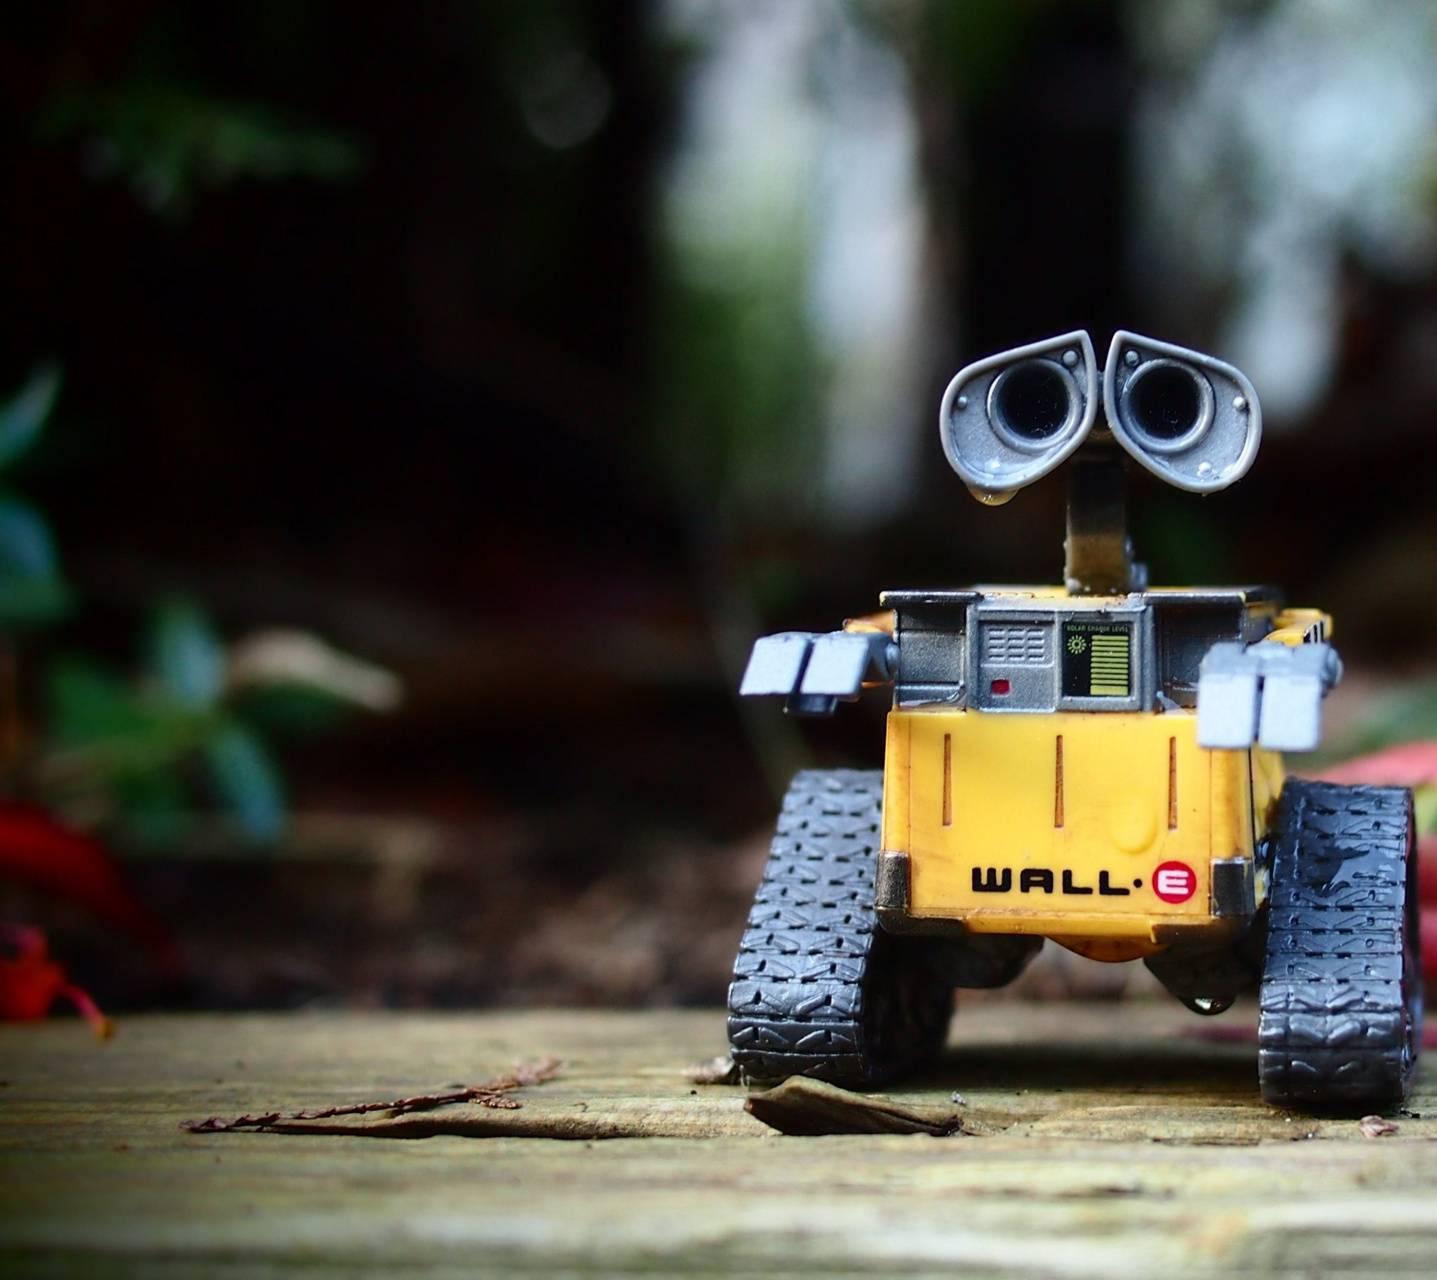 Wall Robot